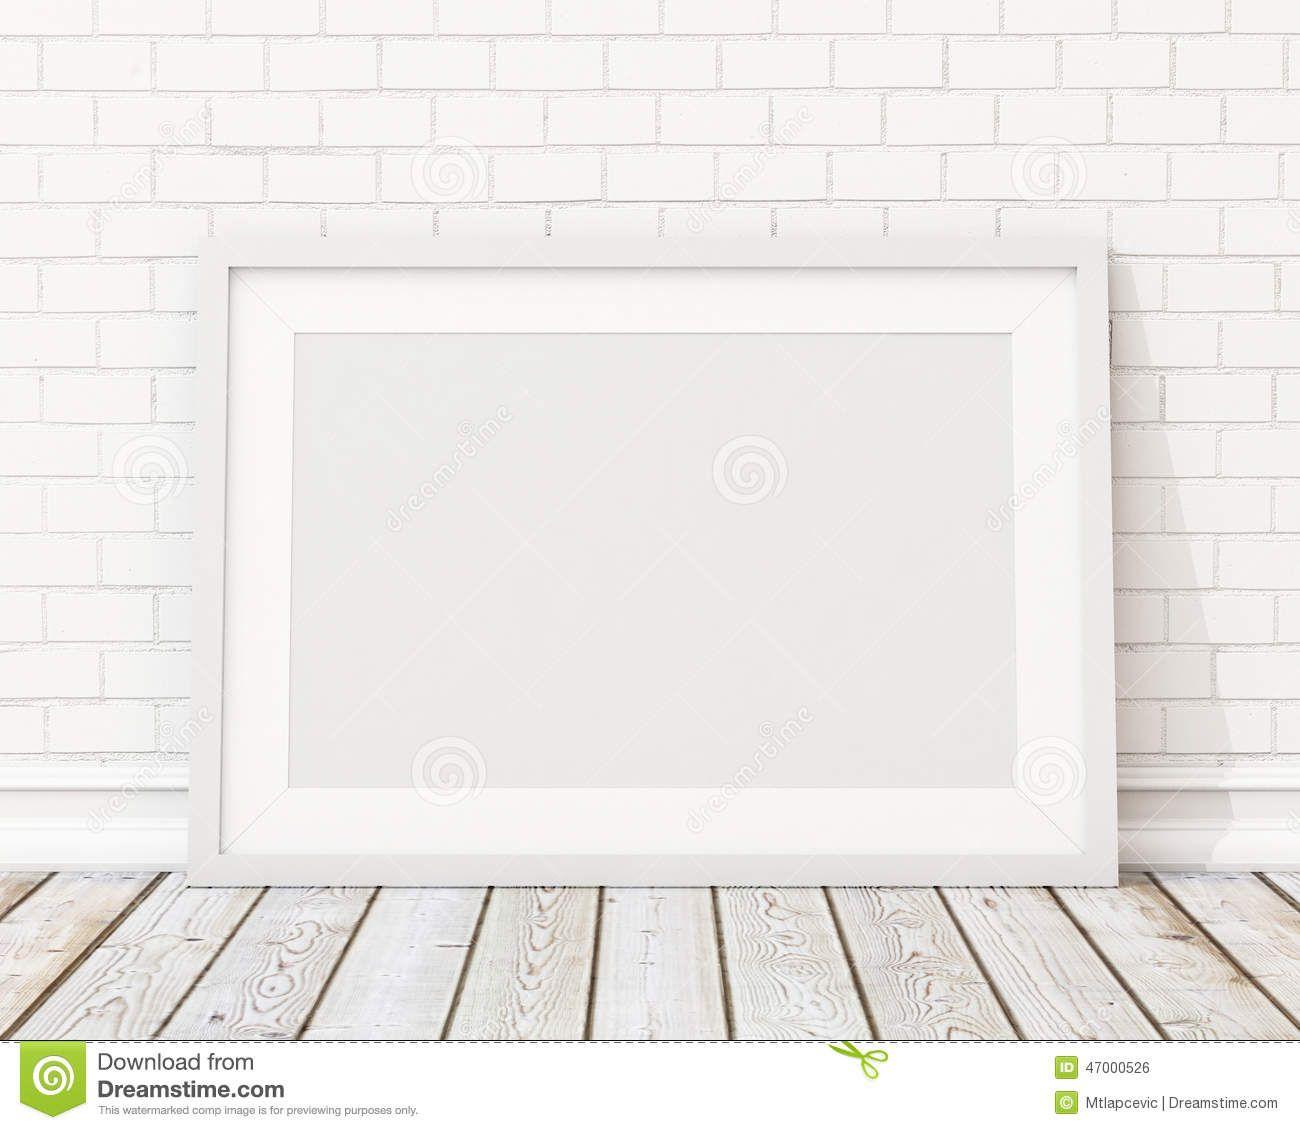 mock-up-blank-white-horizontal-picture-frame-white-brick-wall-vintage-floor-template-design-47000526.jpg (1300×1130)